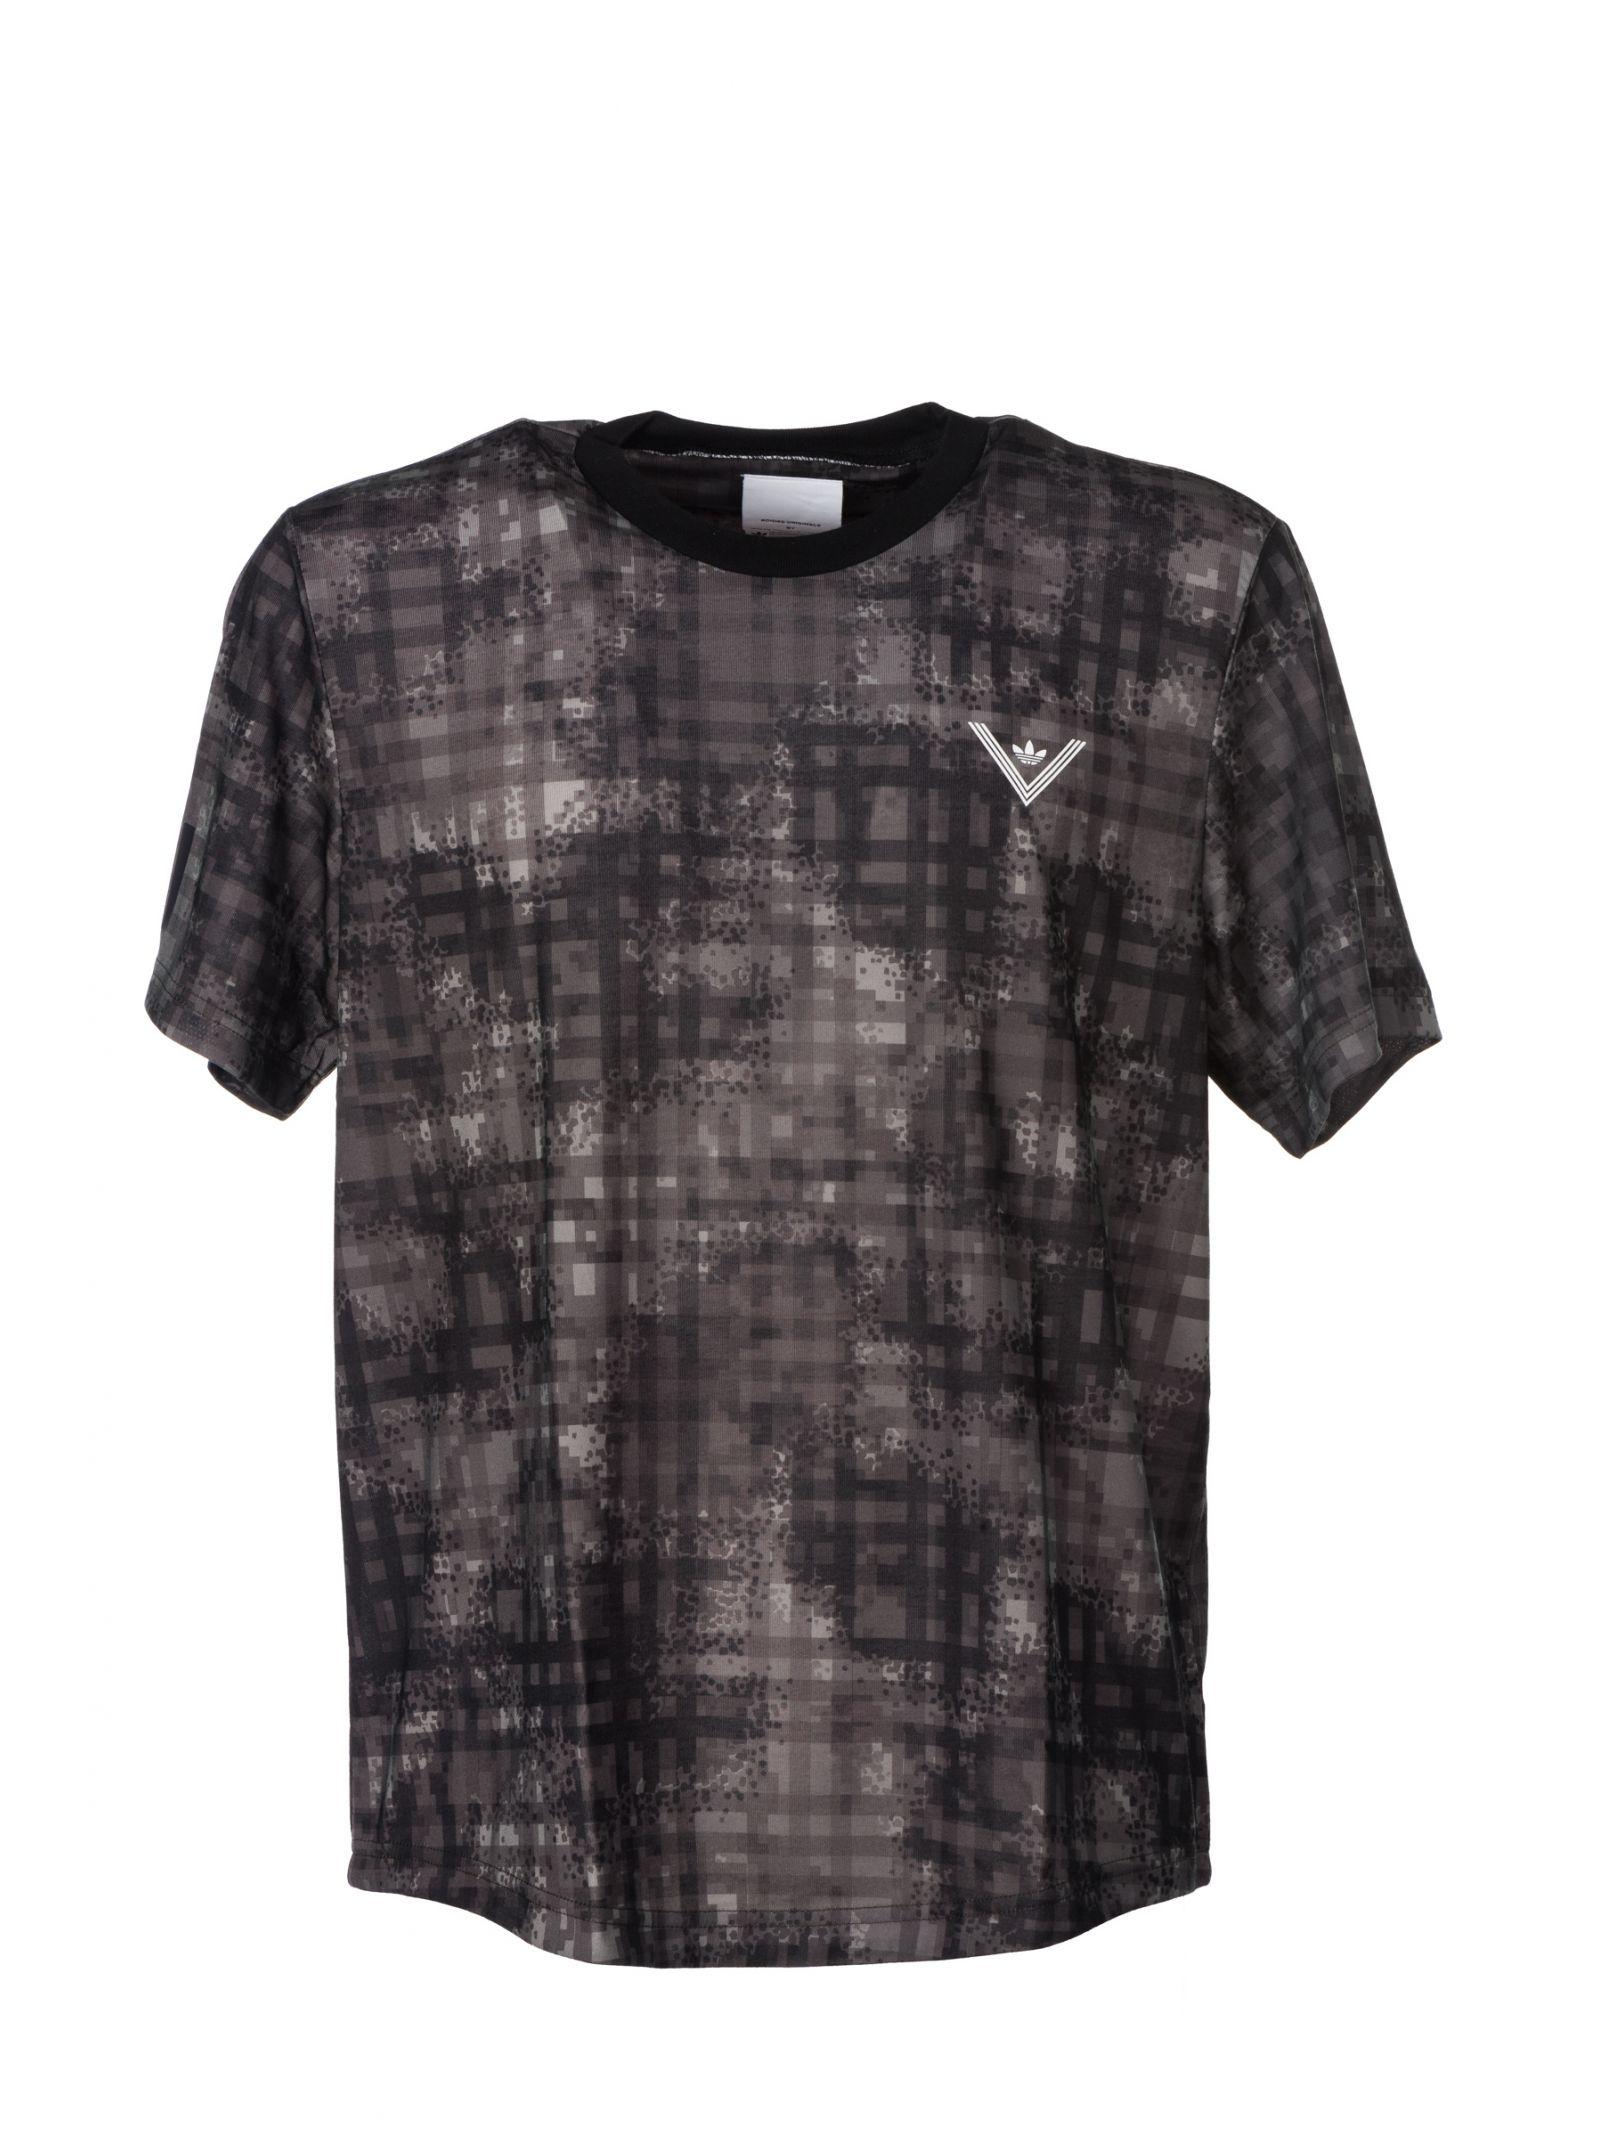 Adidas Originals Adidas X White Mountaineering Graphic T-shirt